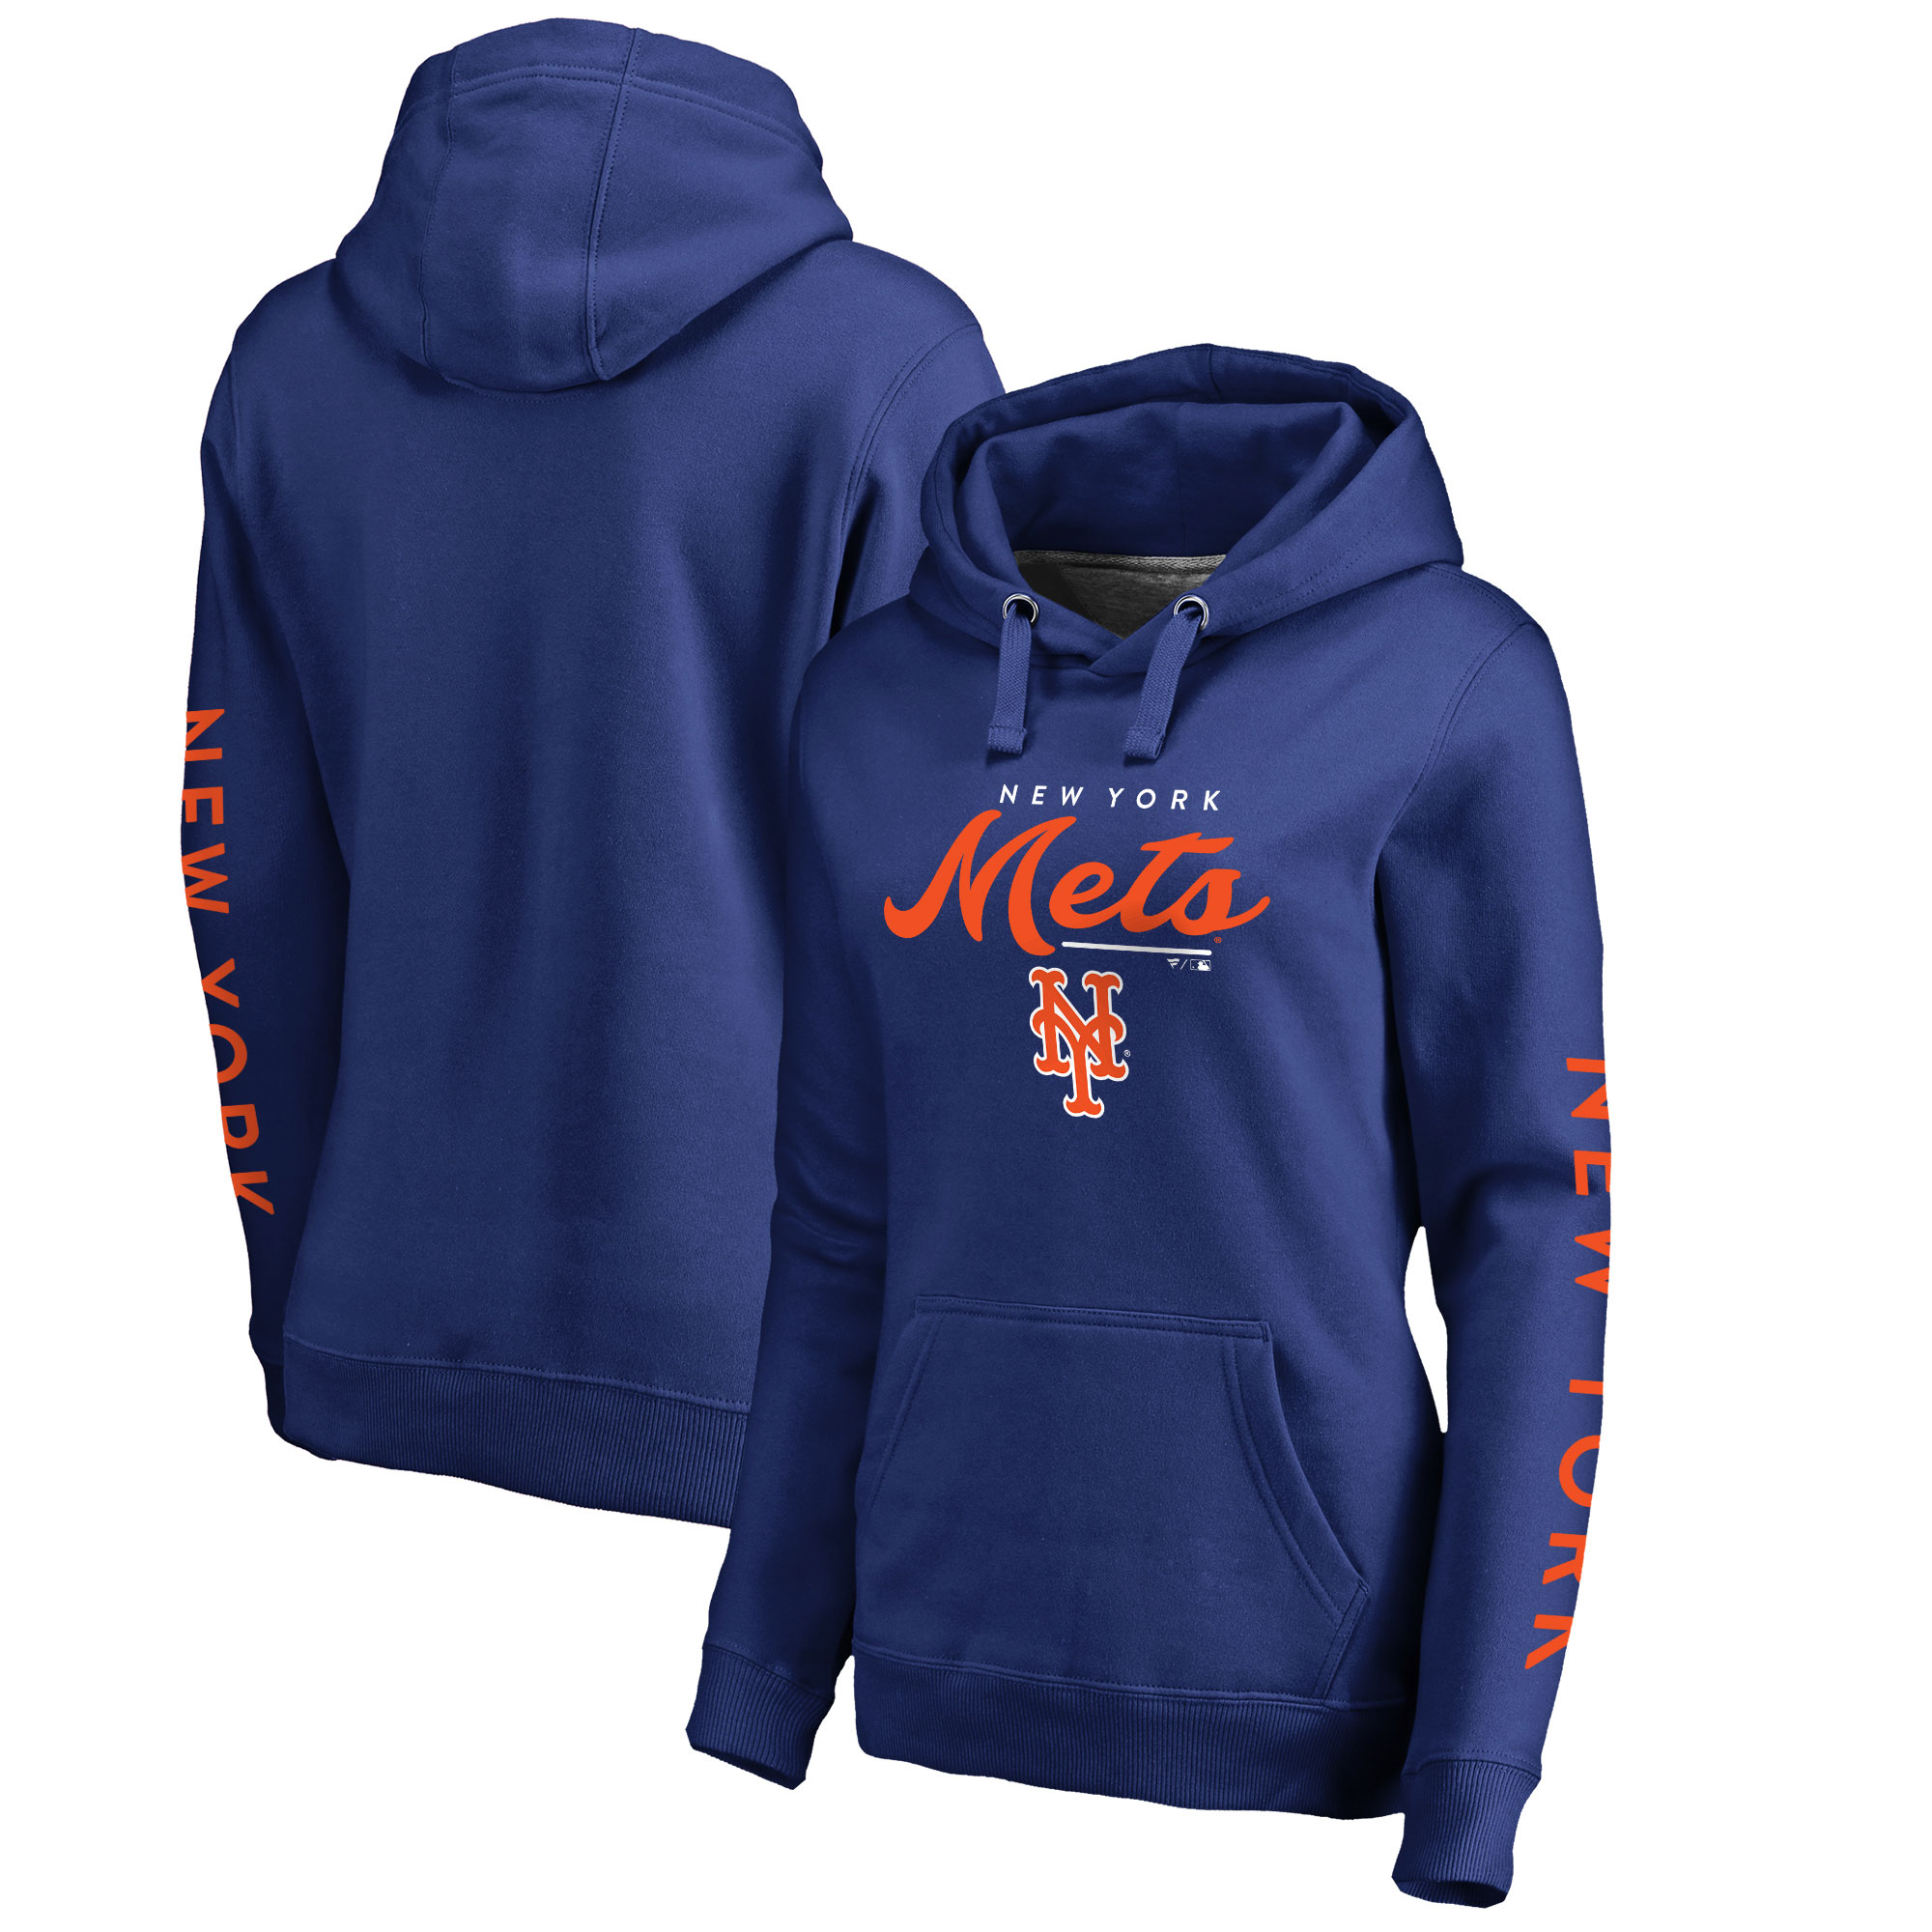 New York Mets Fanatics Branded Women's High Class Pullover Hoodie - Royal